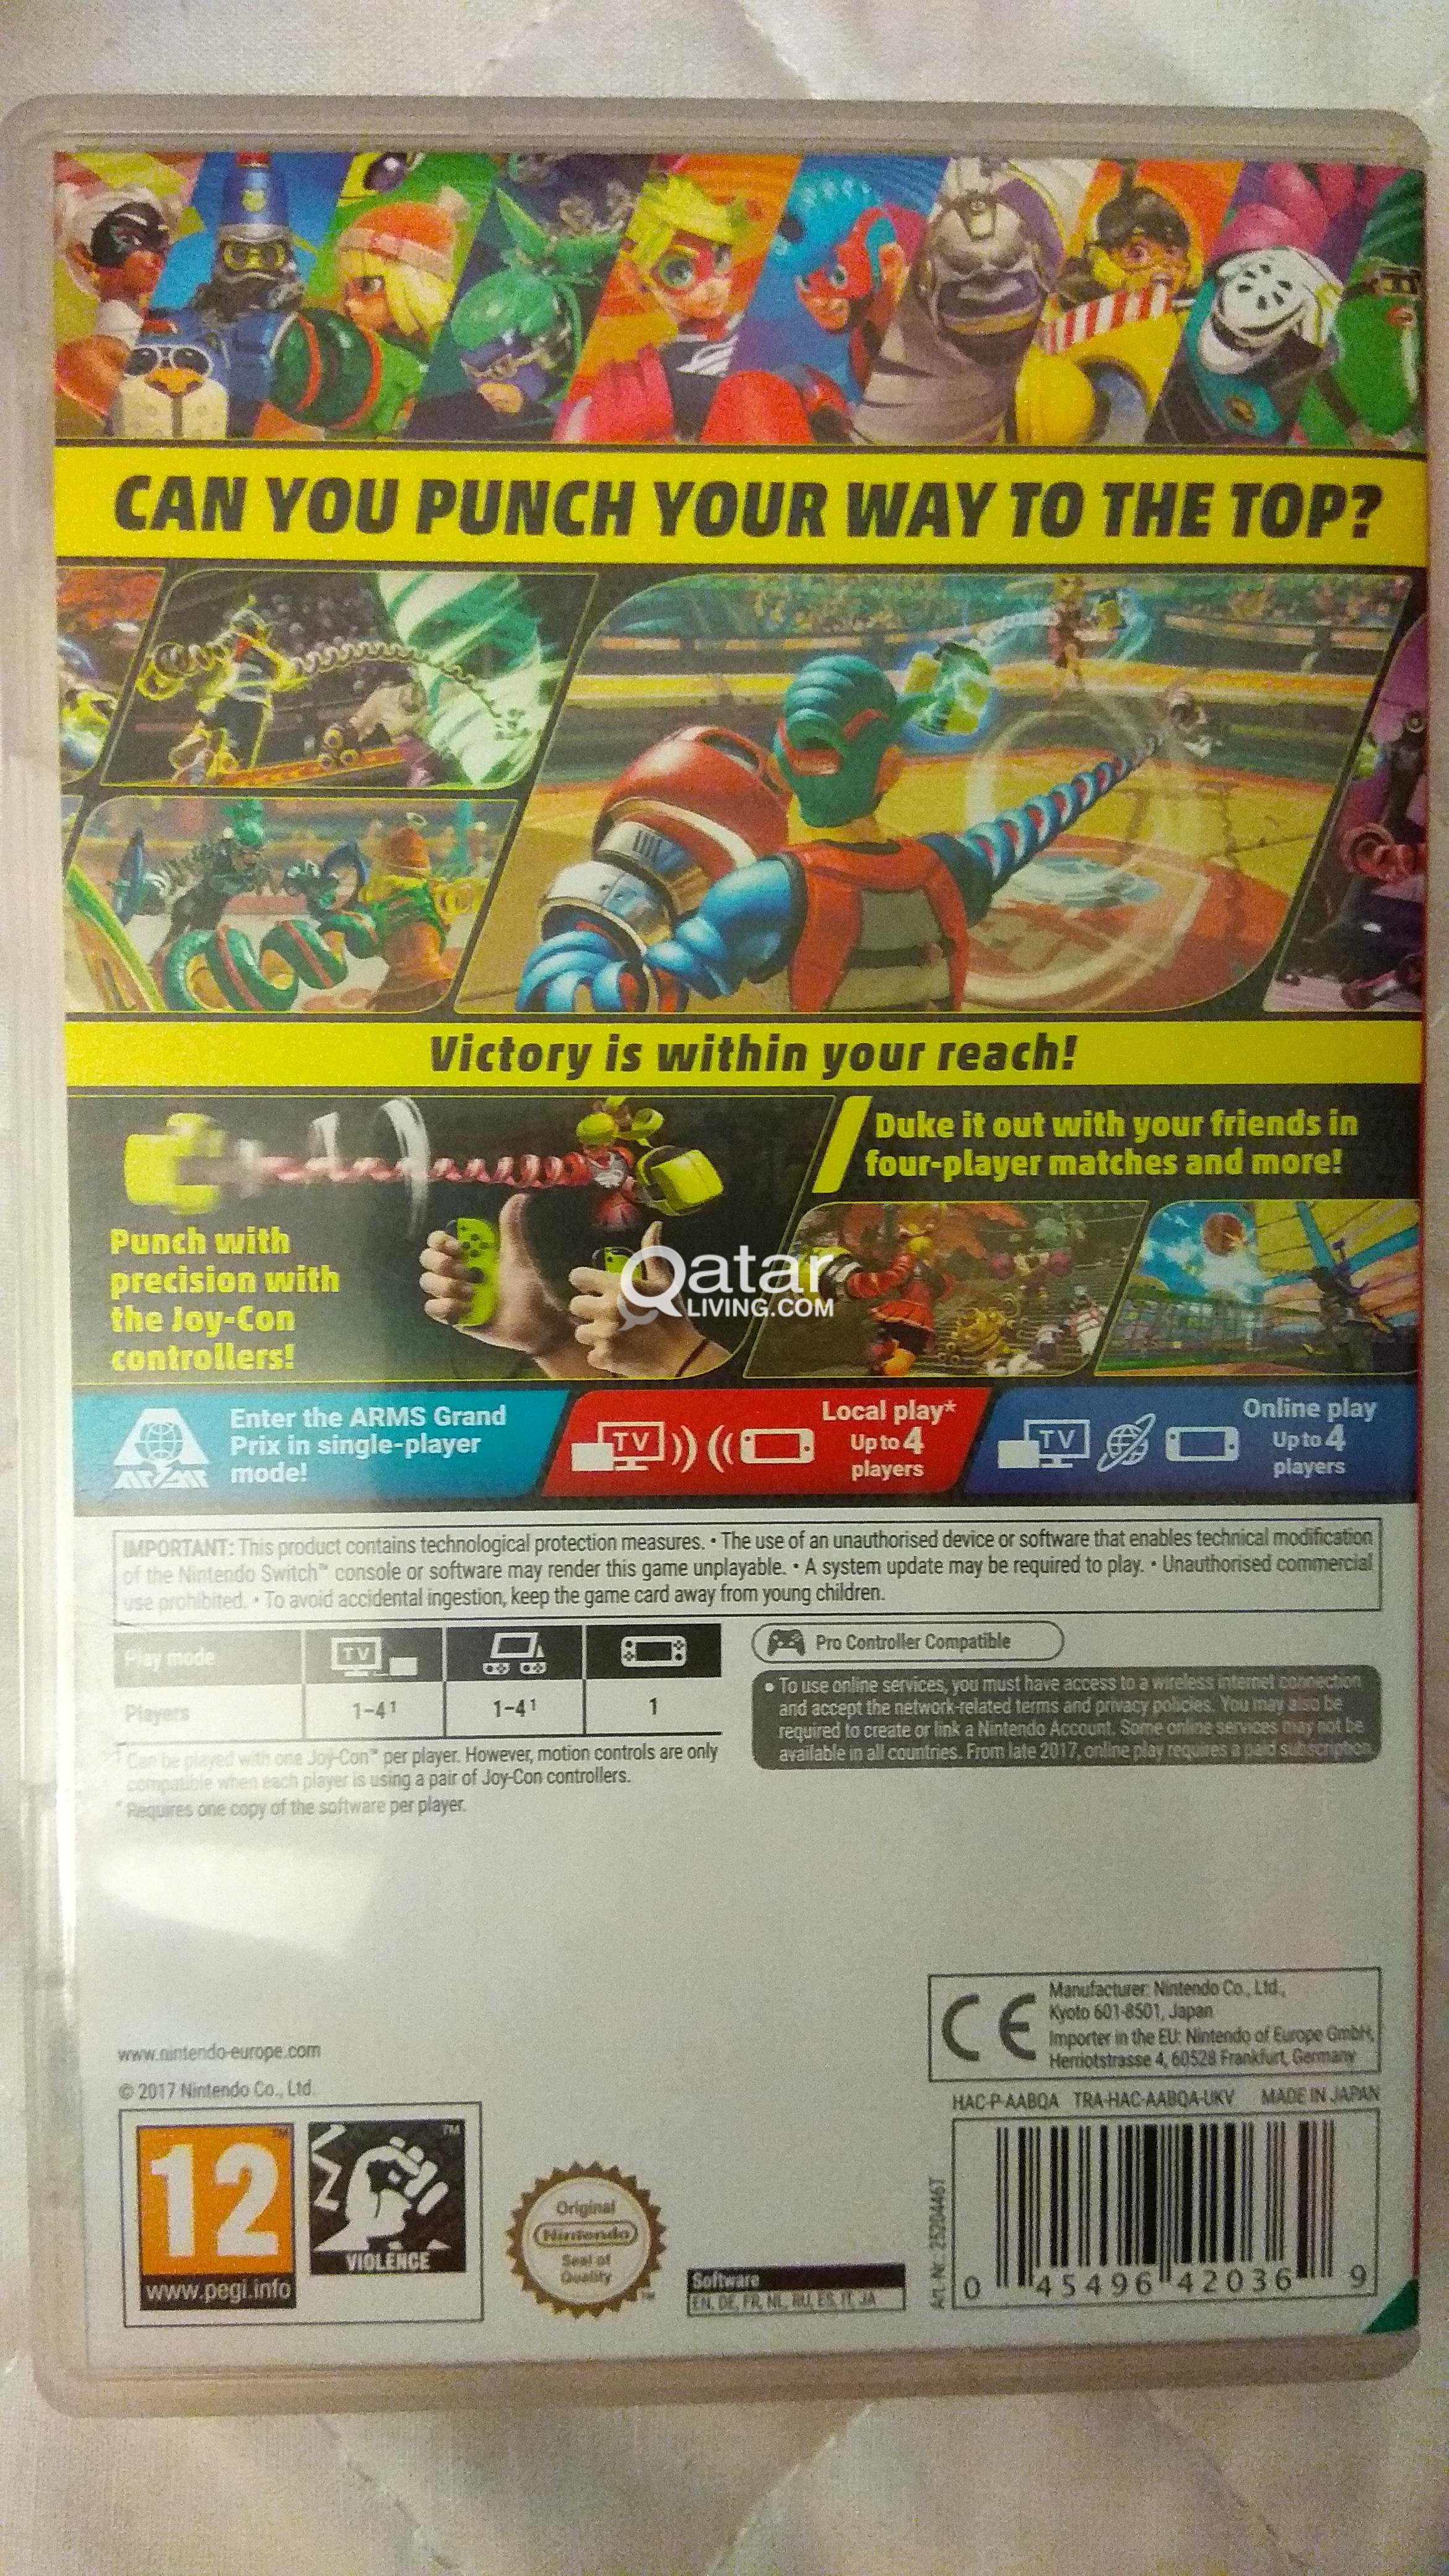 Nintendo Switch Arms Qatar Living Title